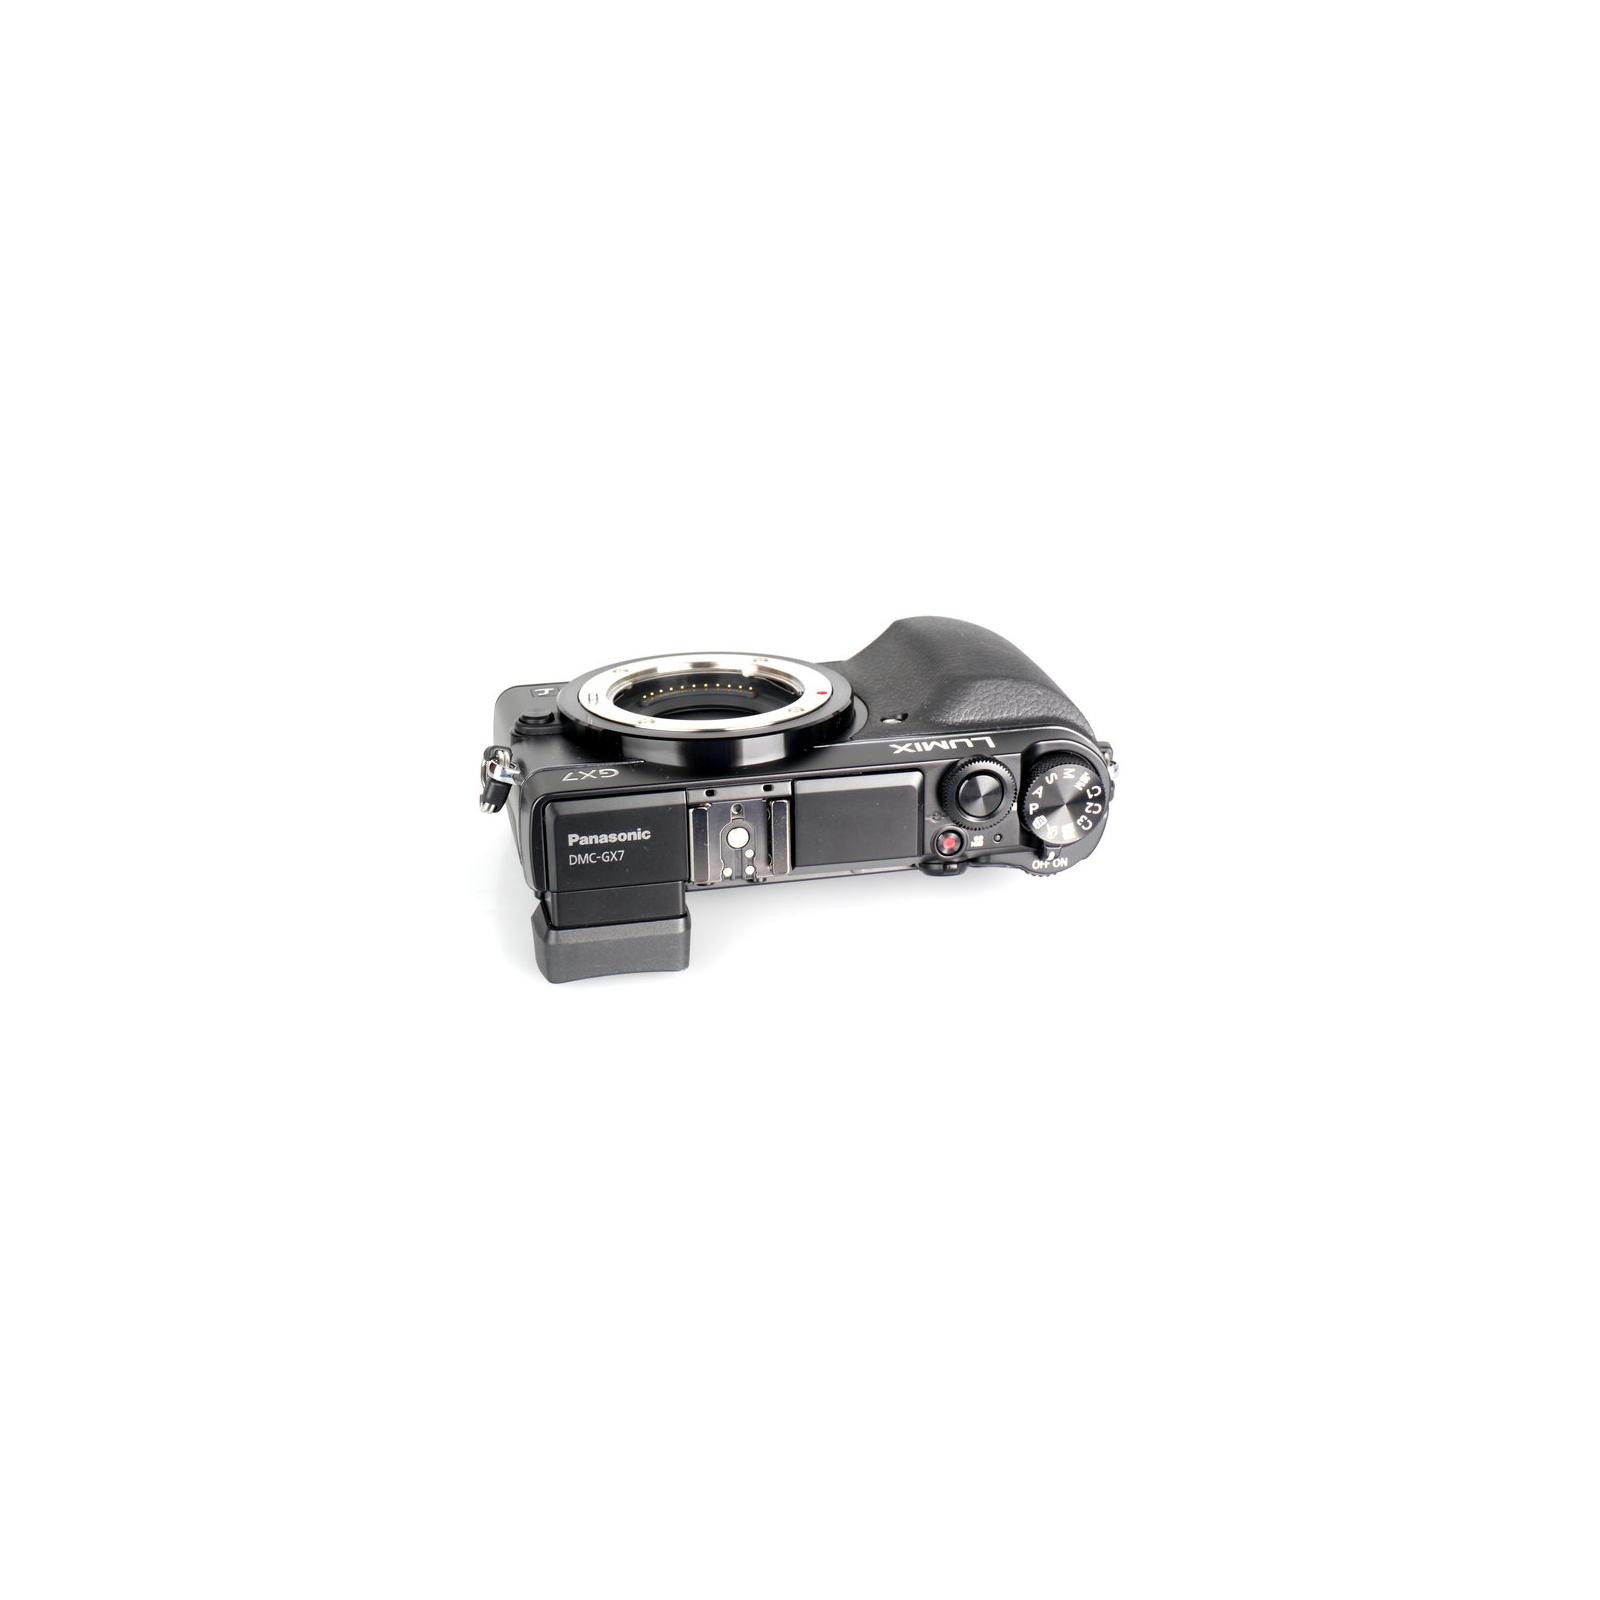 Цифровой фотоаппарат PANASONIC DMC-GX7 Body (DMC-GX7EE-K) изображение 6